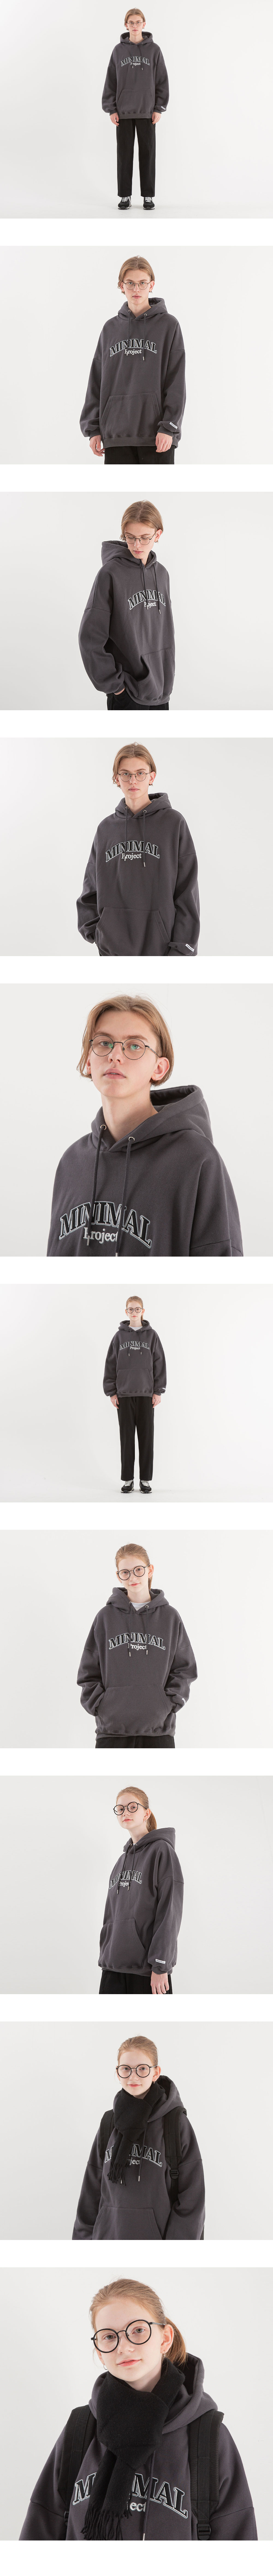 [minimal project] 미니멀프로젝트 쉐도우 자수 오버핏 후드 MHT105 [DARKGREY]